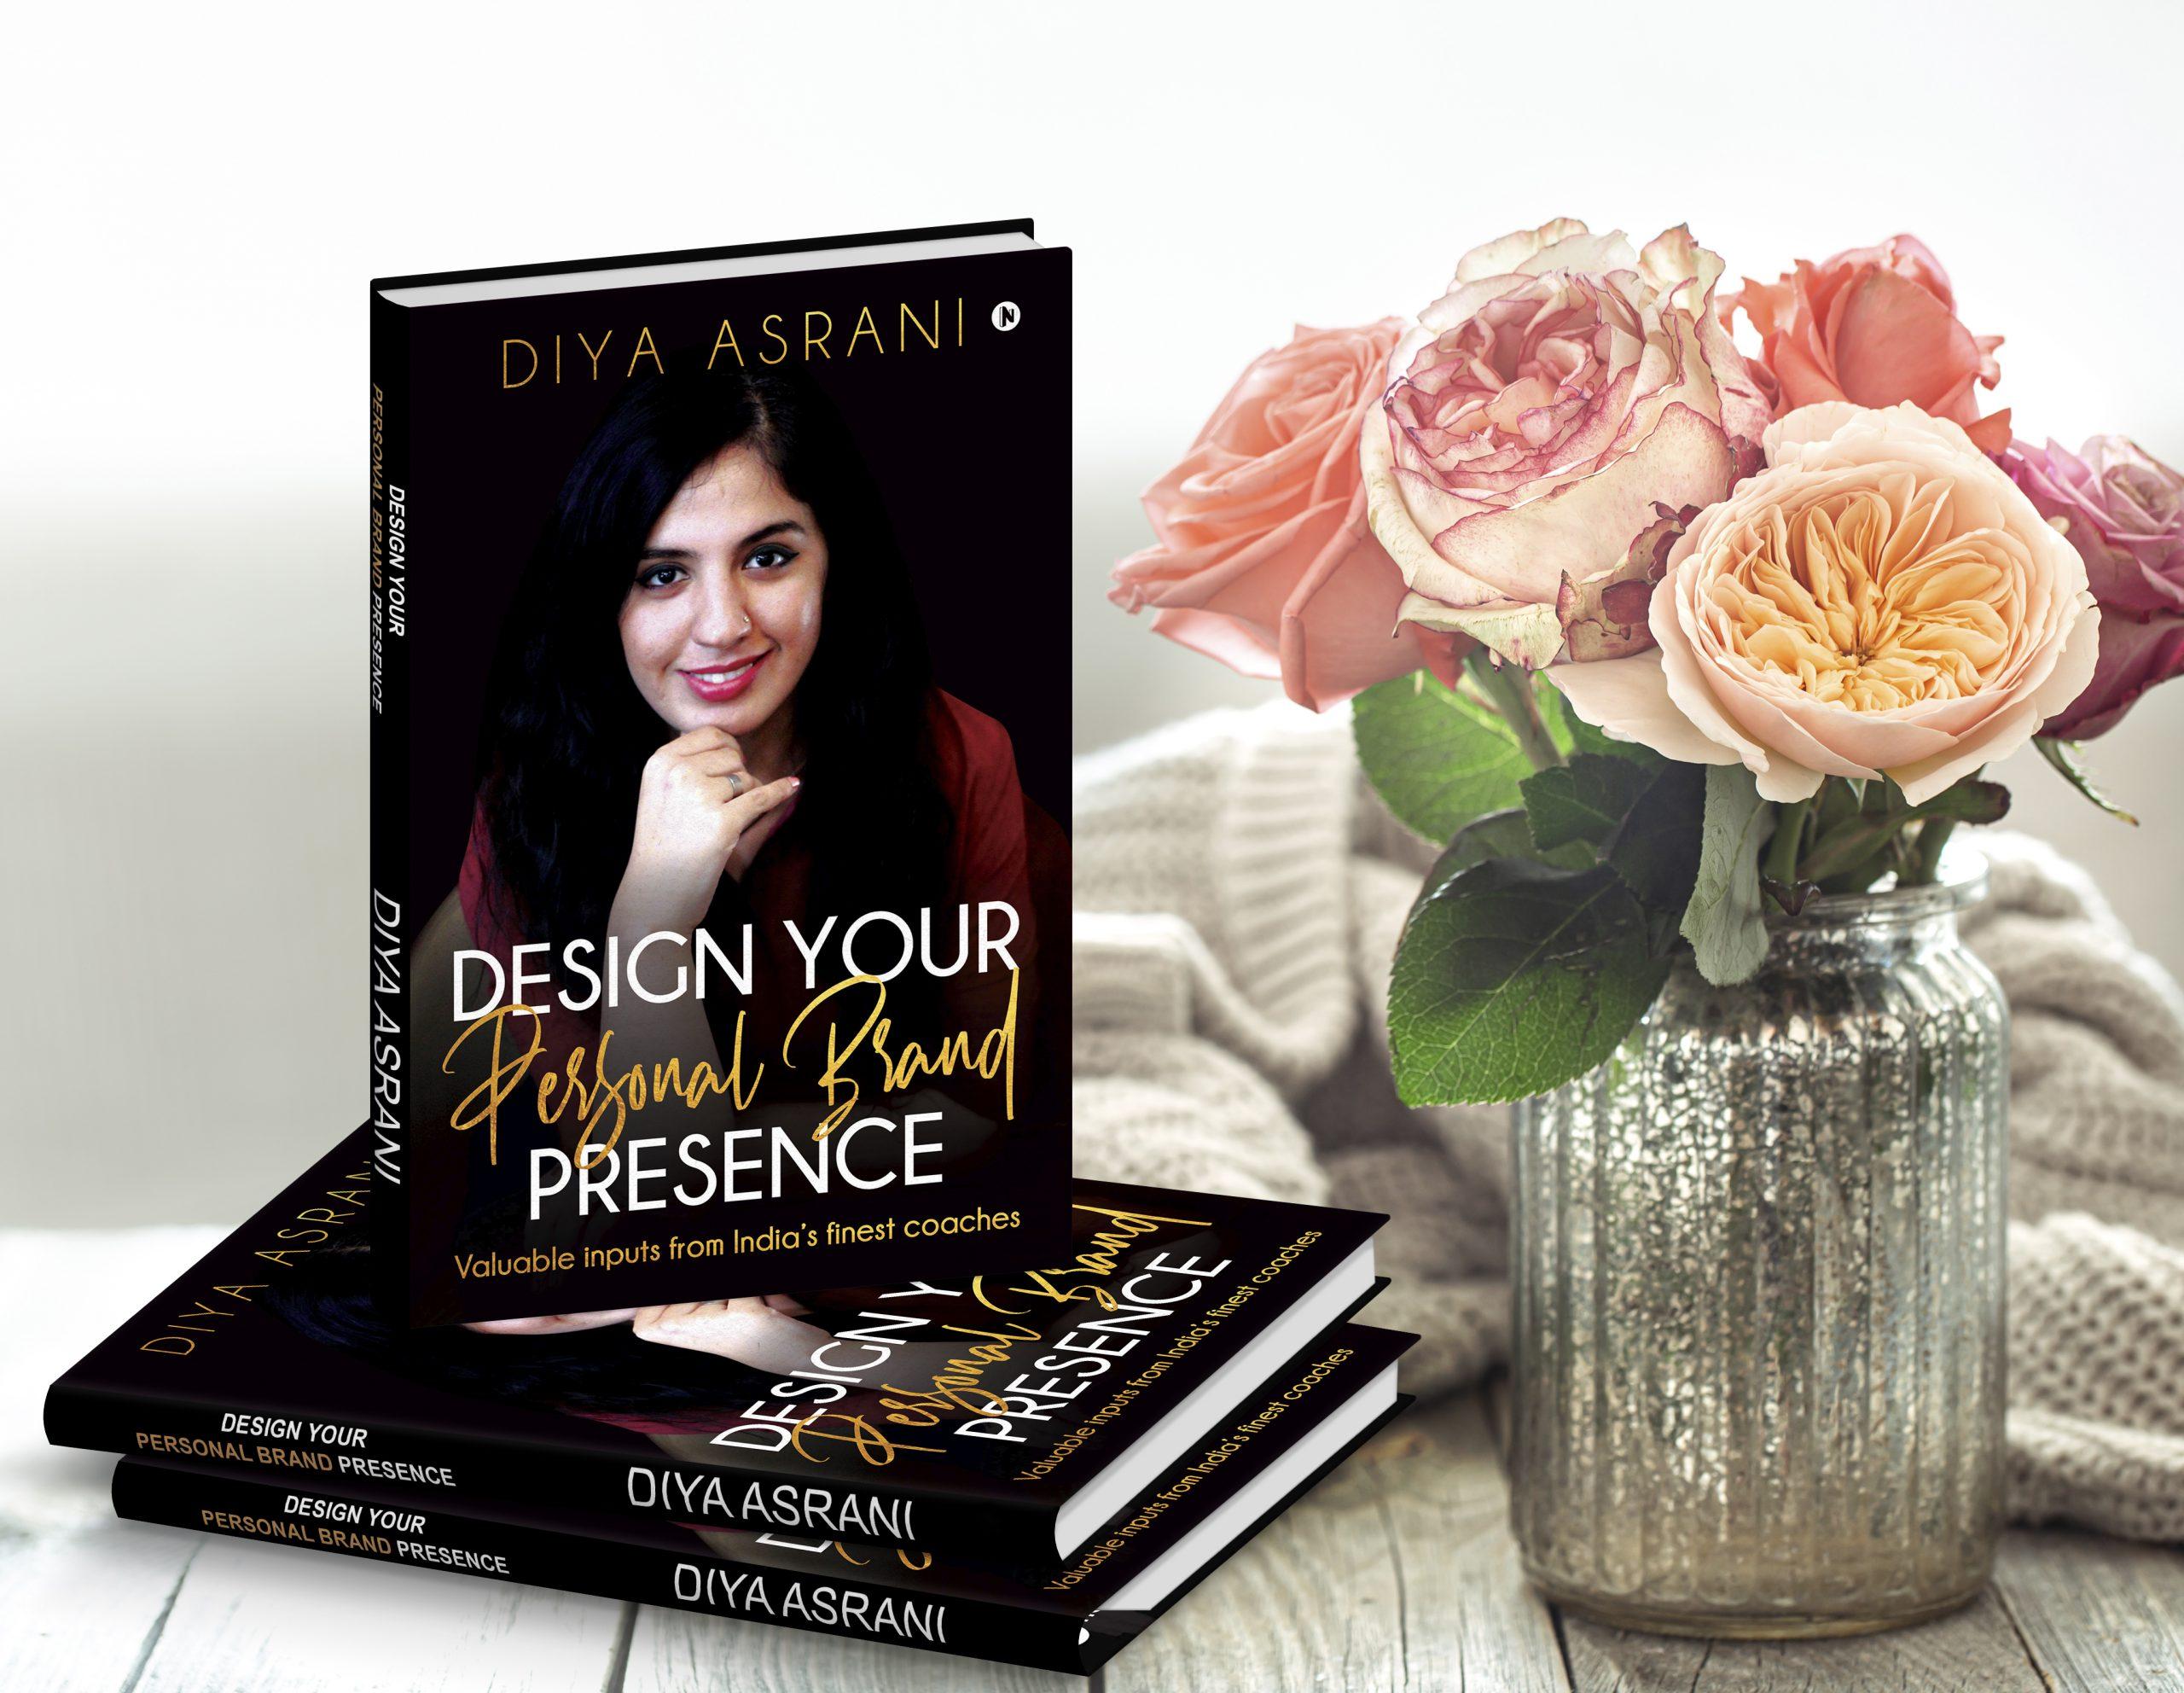 Design Your PERSONAL BRAND Presence by Diya Asrani